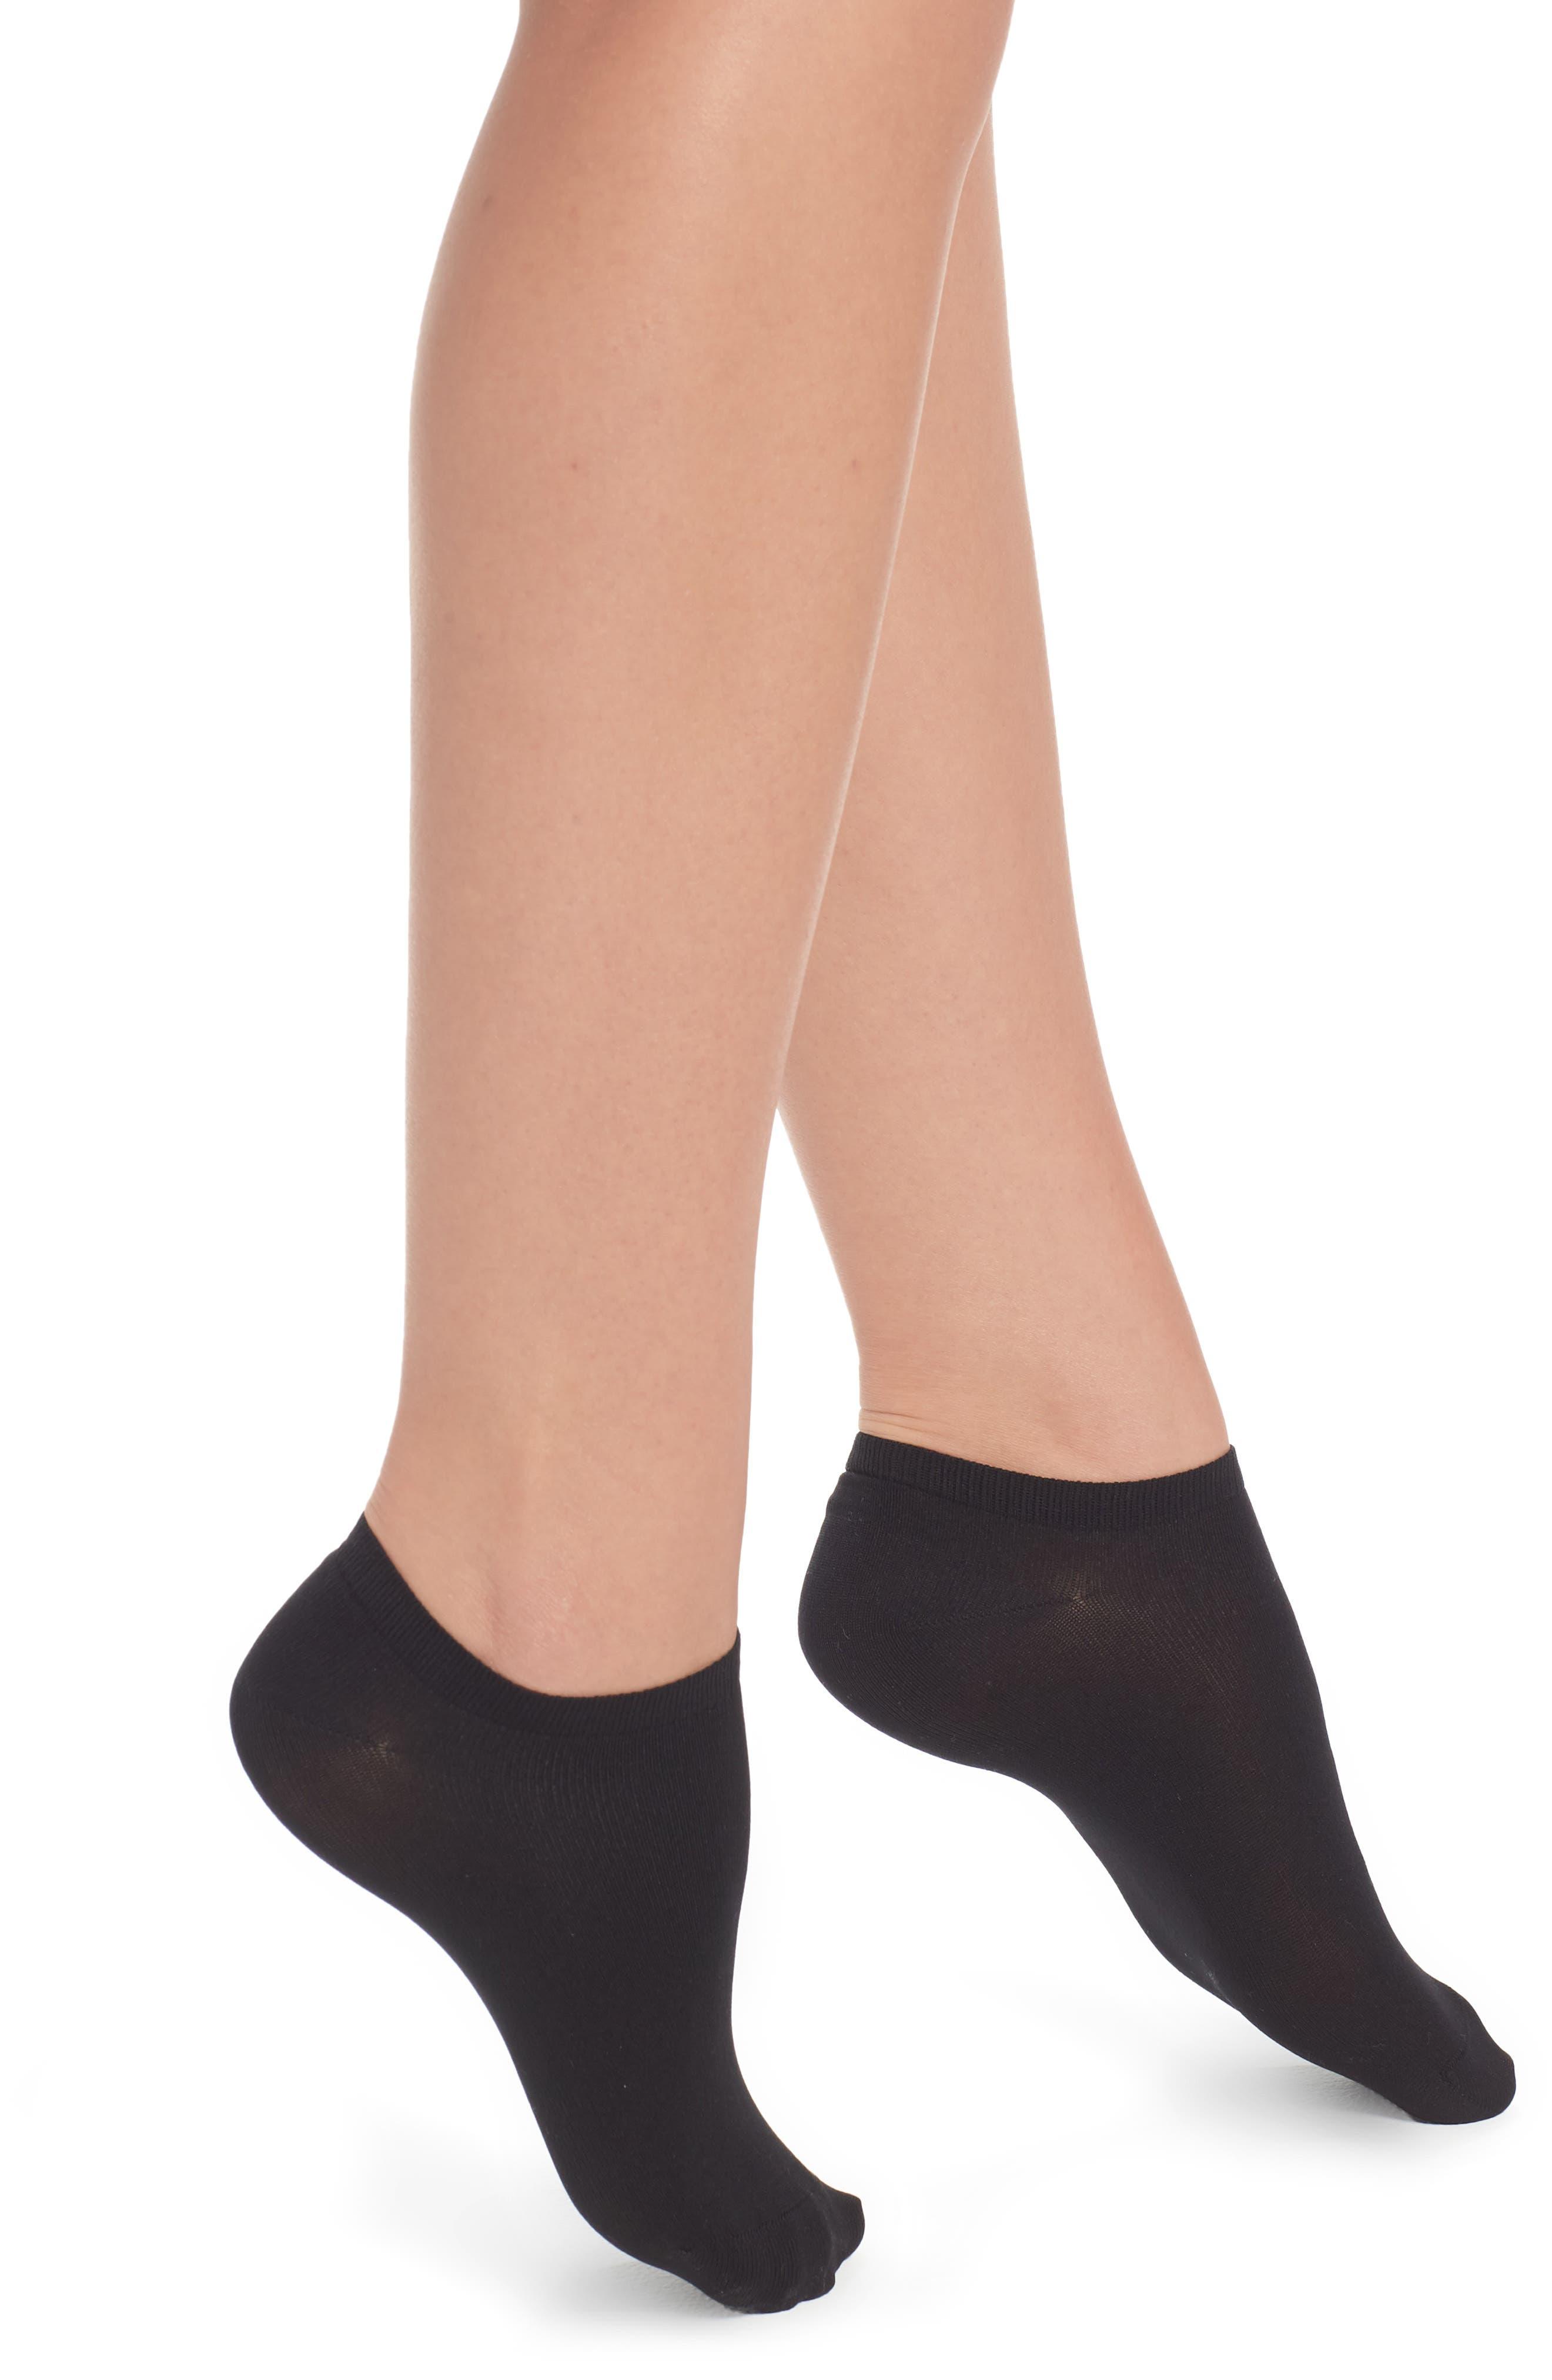 Sara Low-Cut Socks,                             Main thumbnail 1, color,                             001